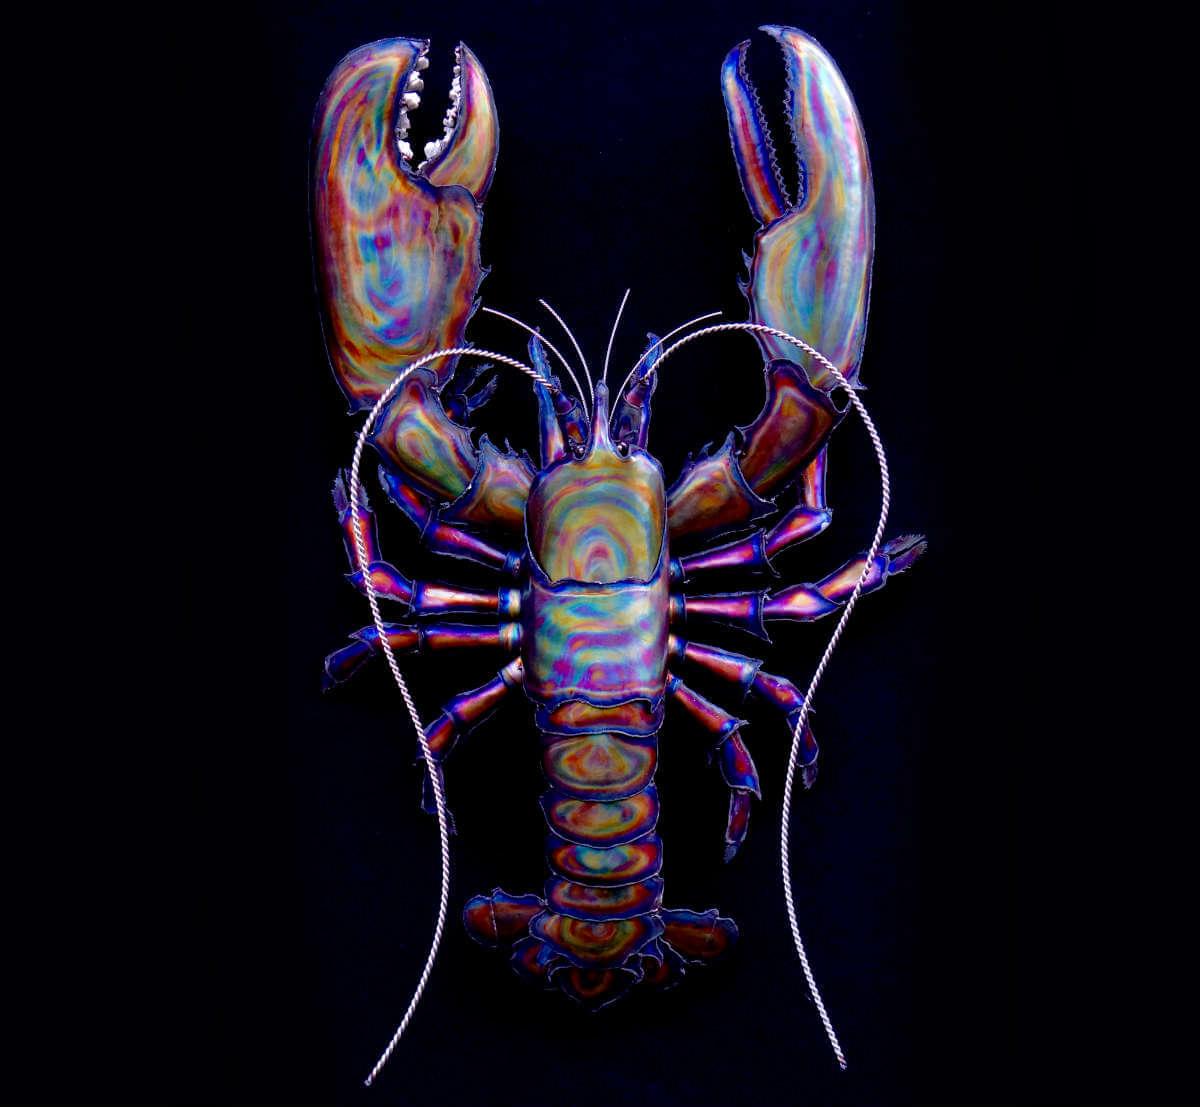 Metal striped lobster sculpture